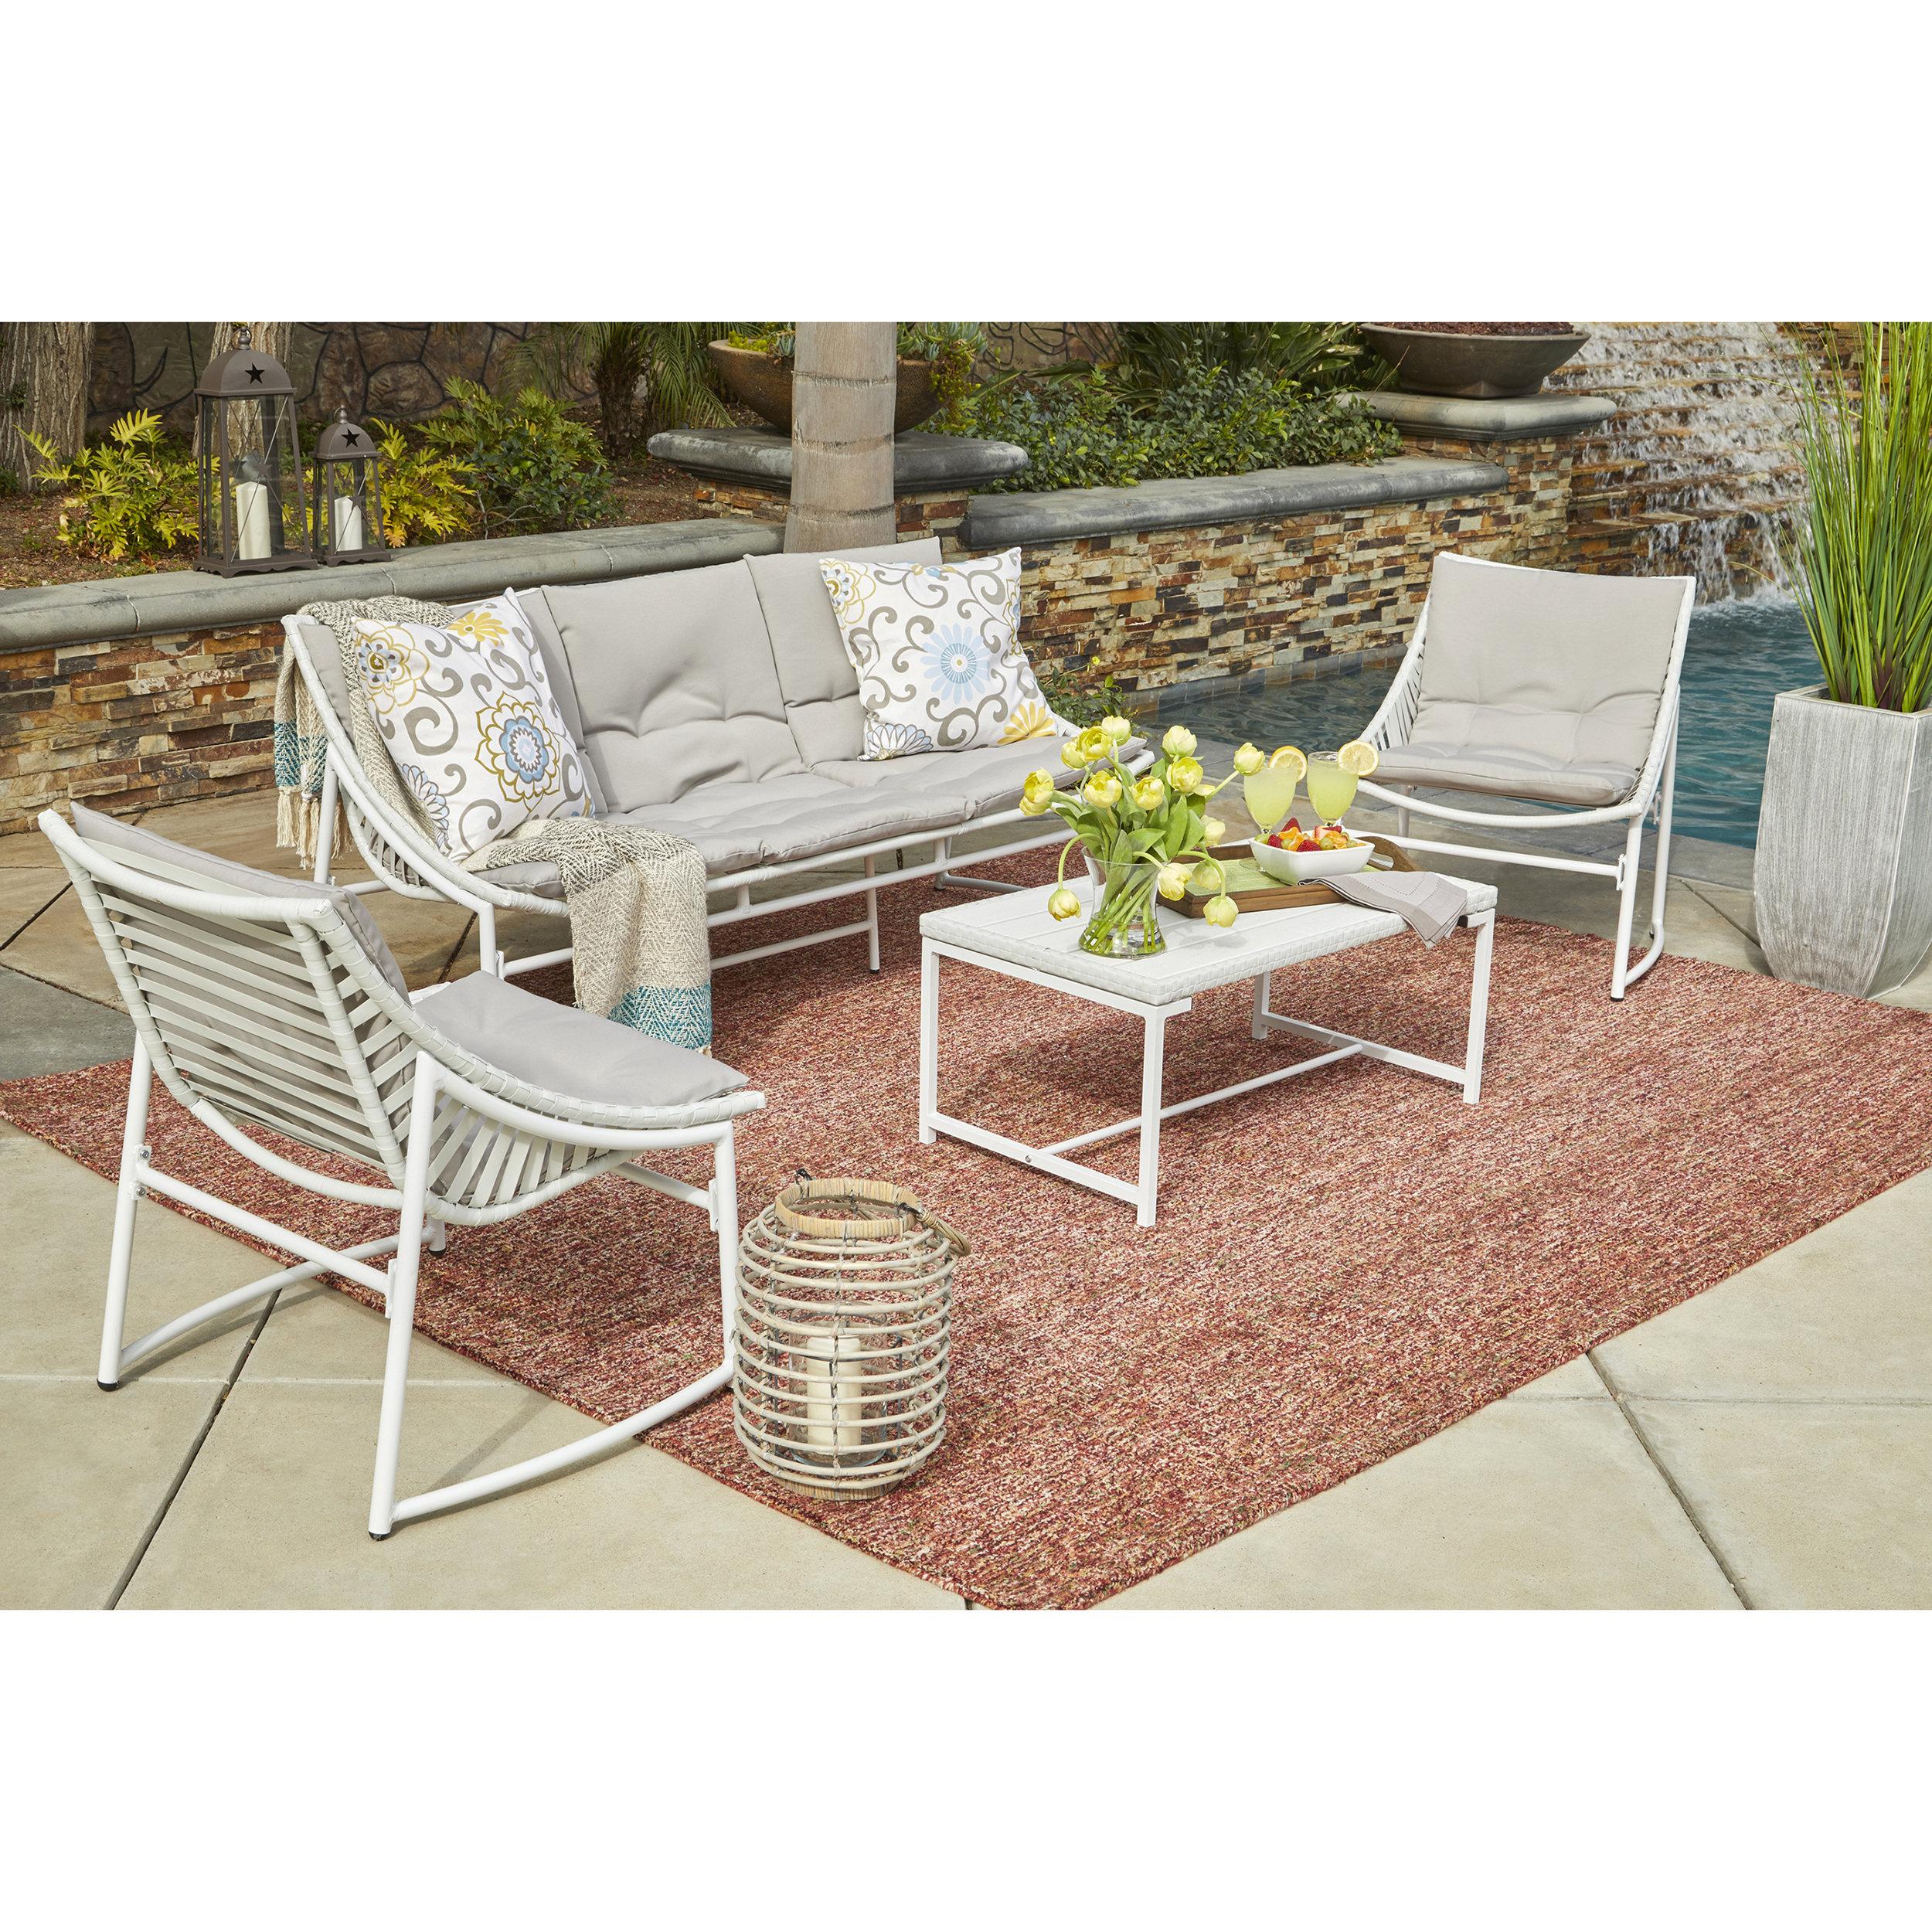 crick 4 piece sunbrella sofa set with cushions reviews joss main